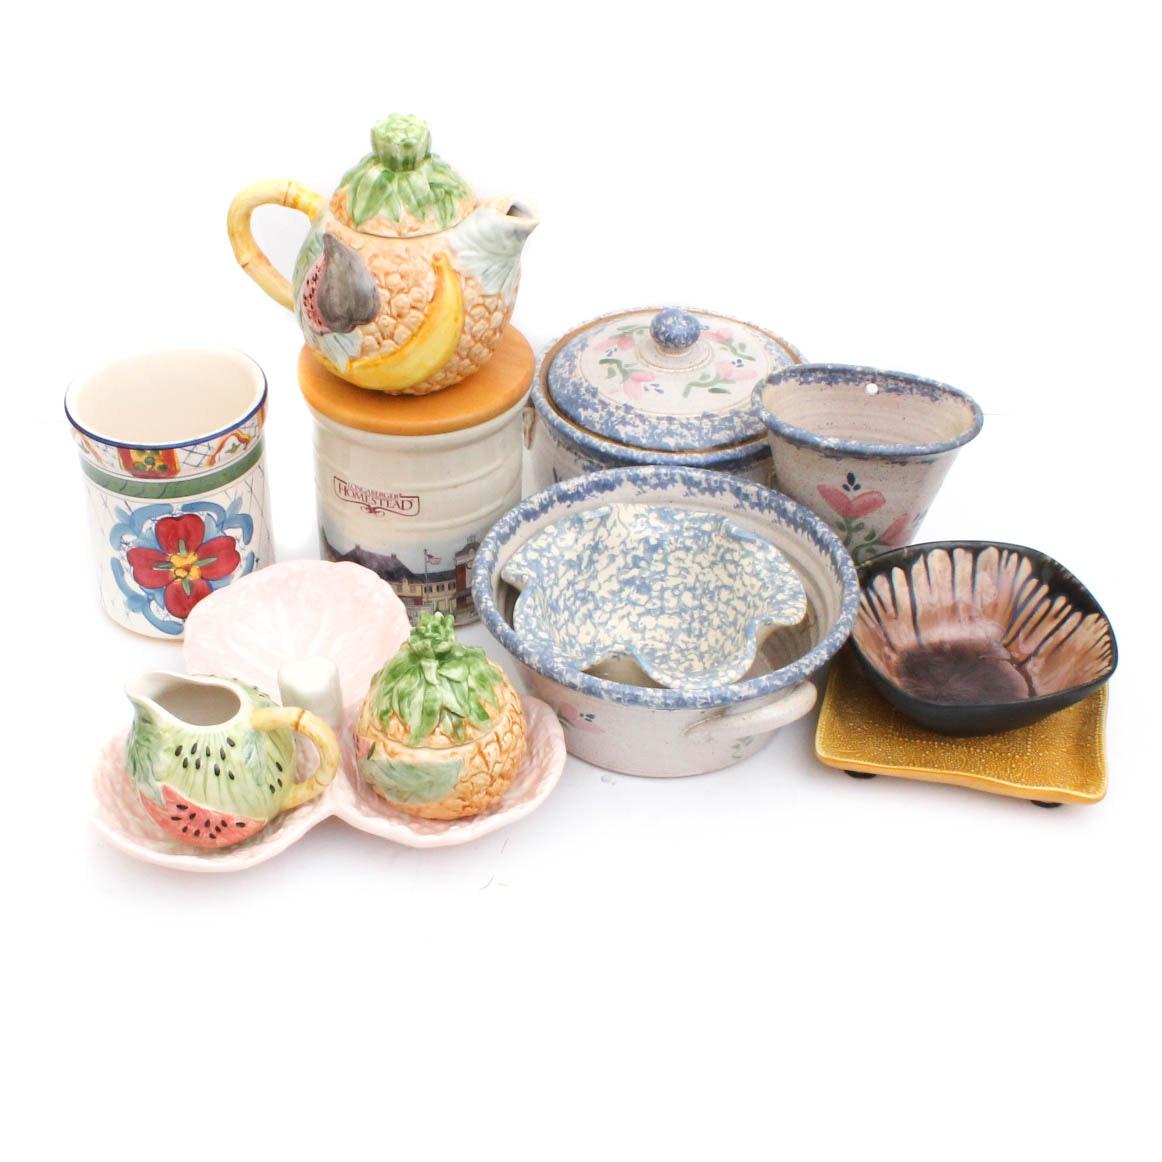 Ceramic Tableware and Decor Featuring Longaberger